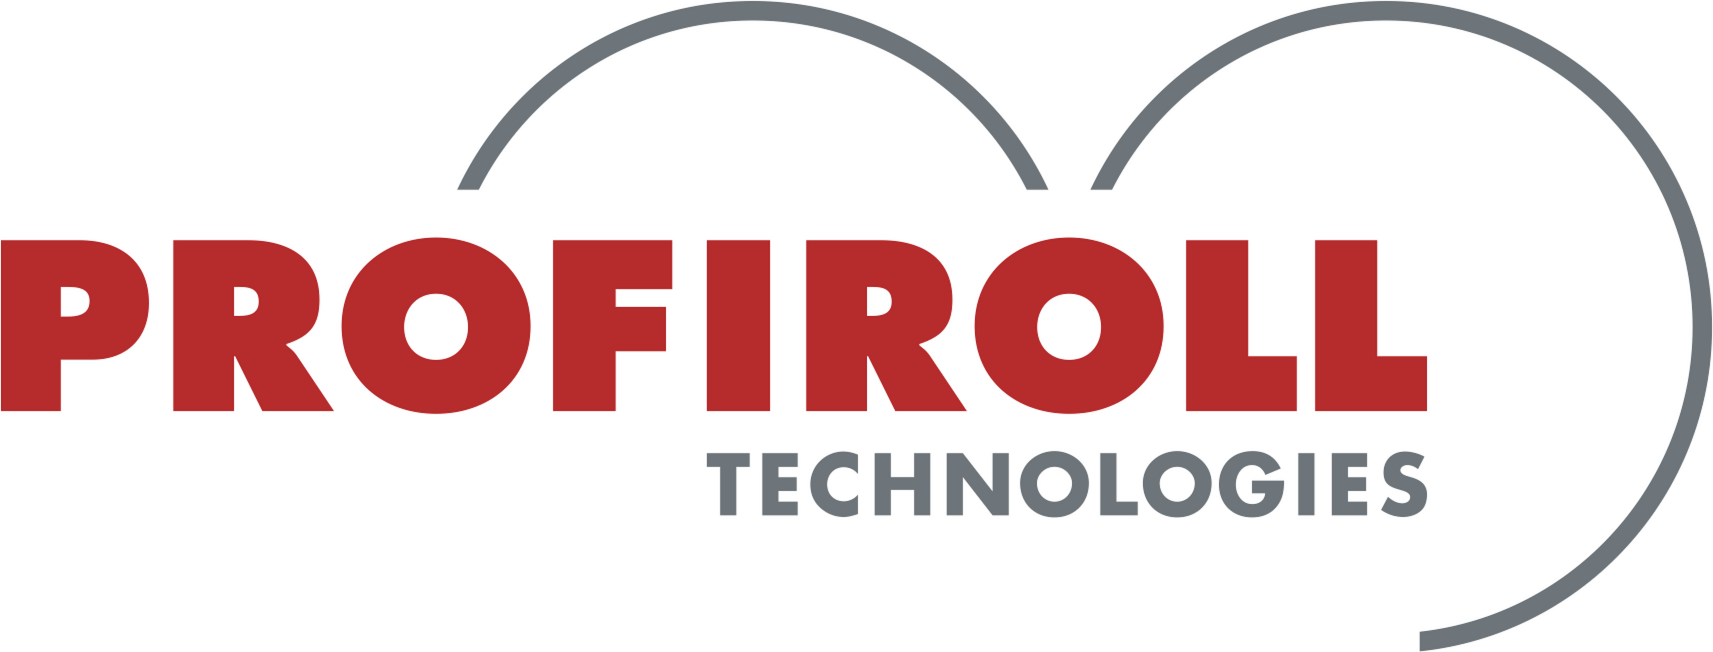 Profiroll Technologies GmbH